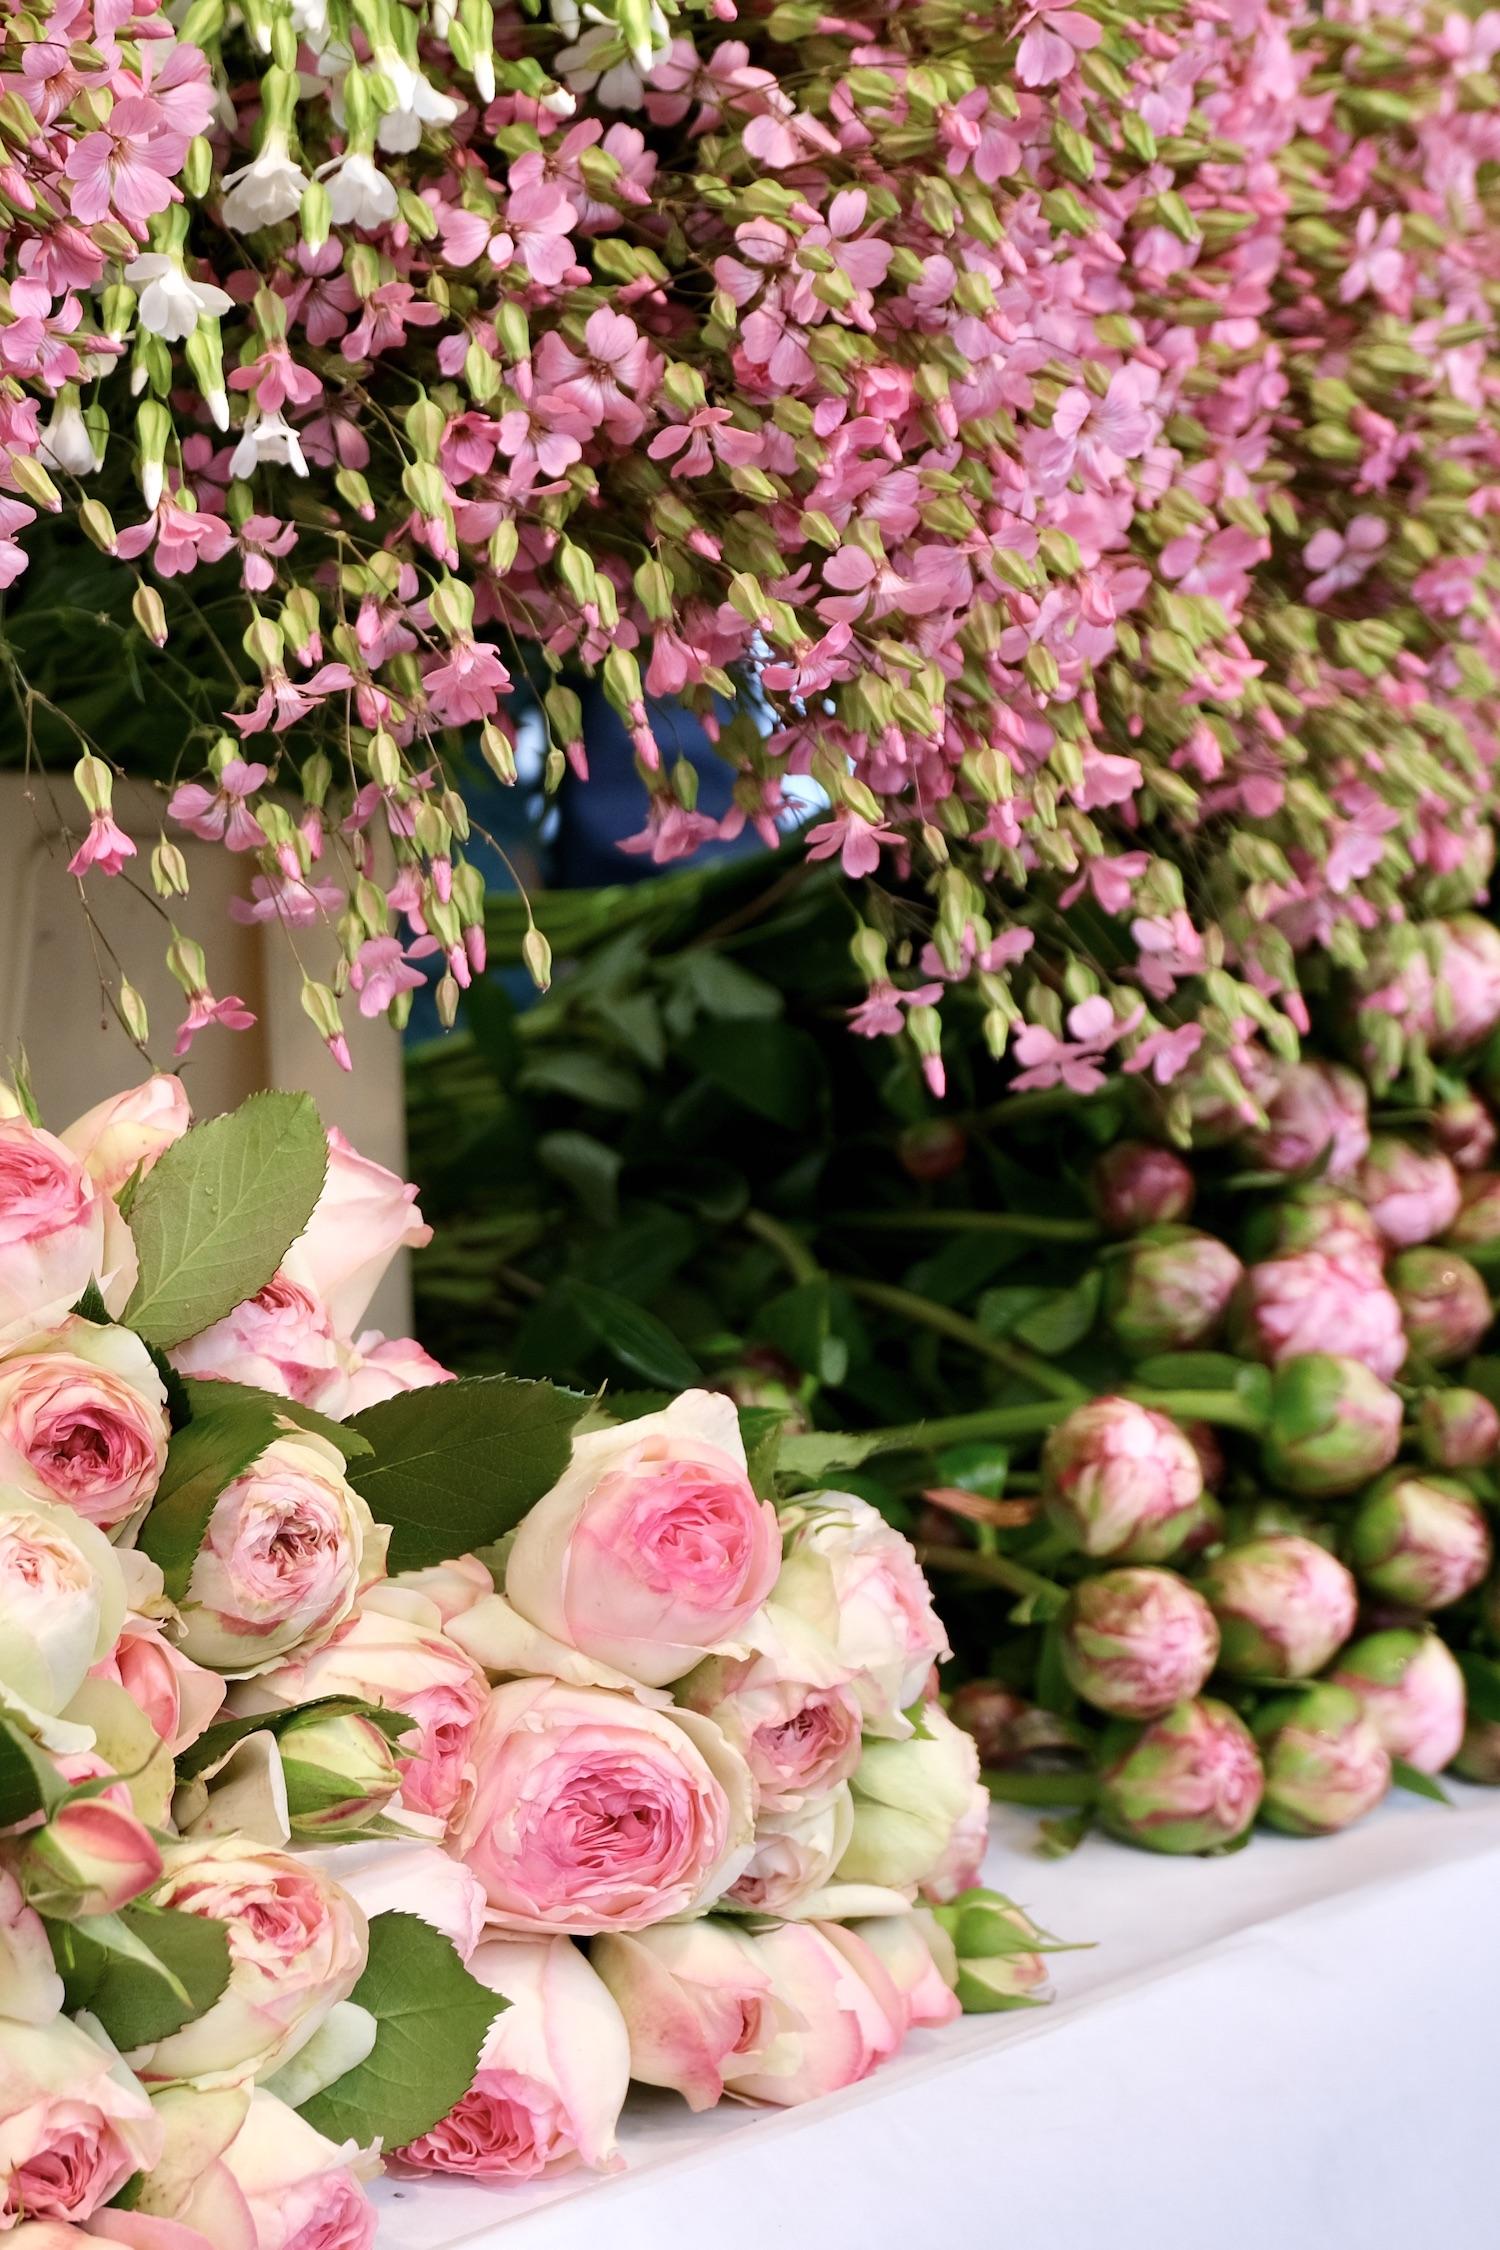 Flowers at the Marché Raspail following my post-confinement return to Paris